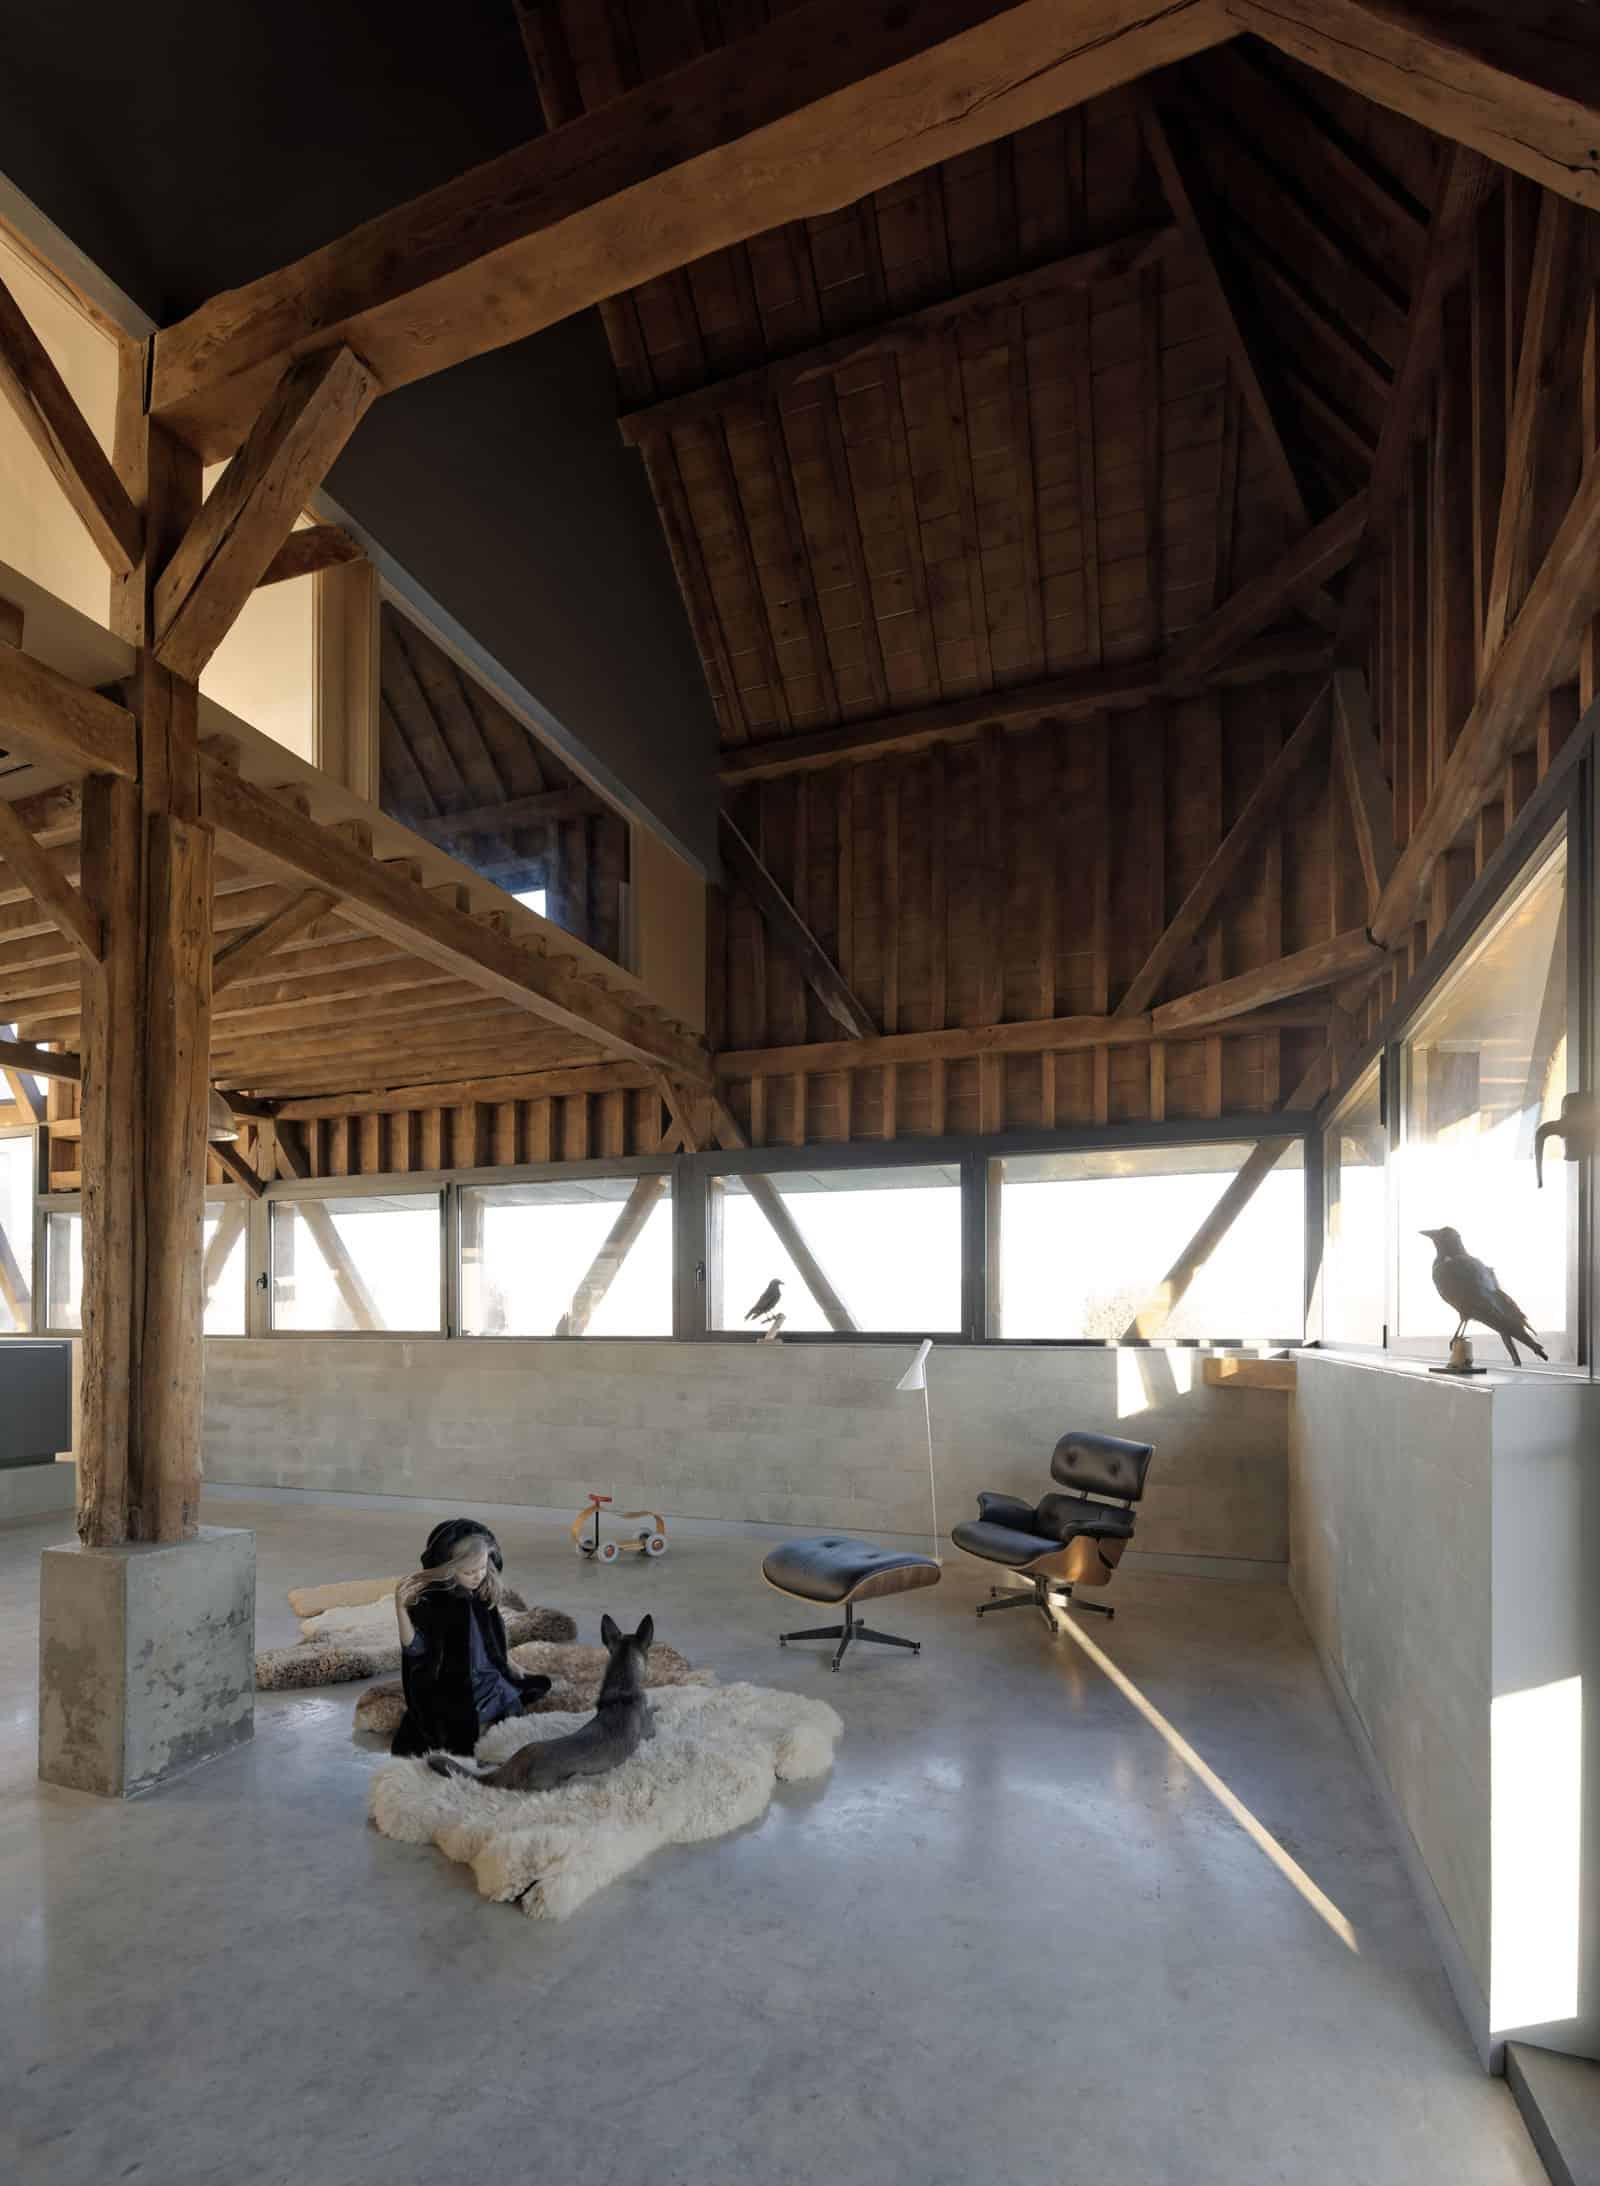 Antonin-Ziegler-covers-abandoned-barn-in-zinc-plates-04